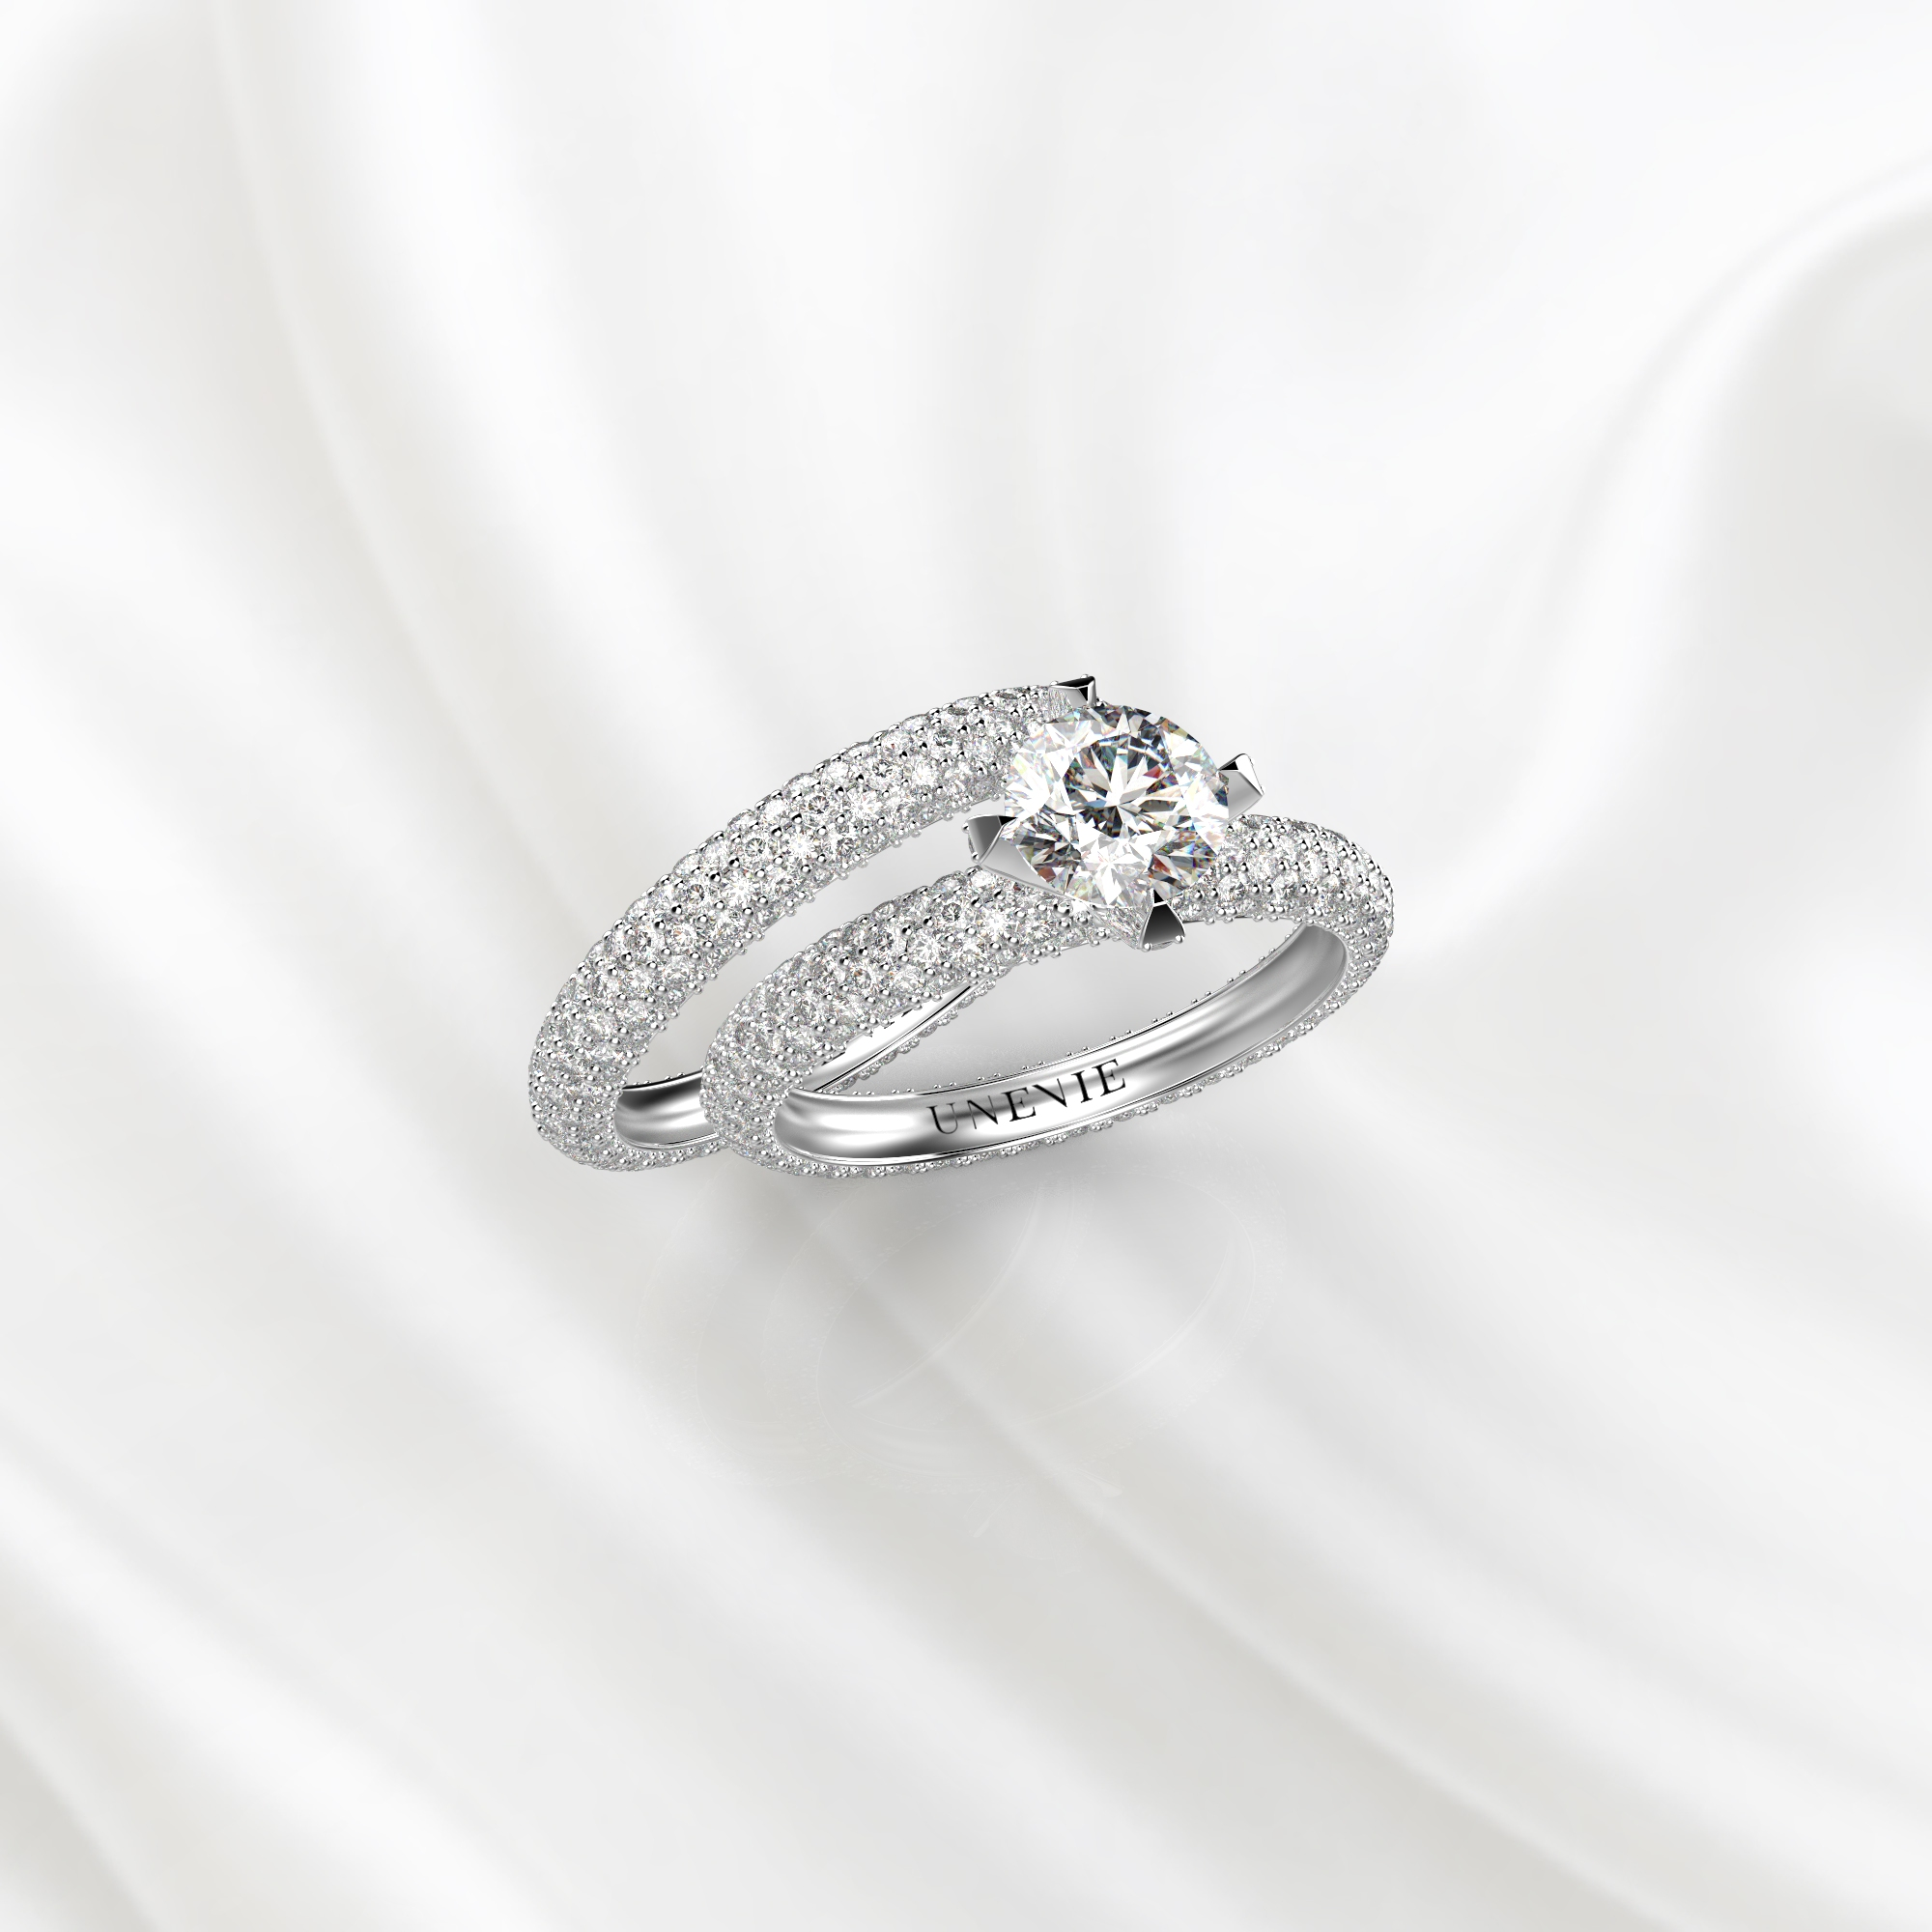 N26 Сет колец для помолвки из белого золота с бриллиантами